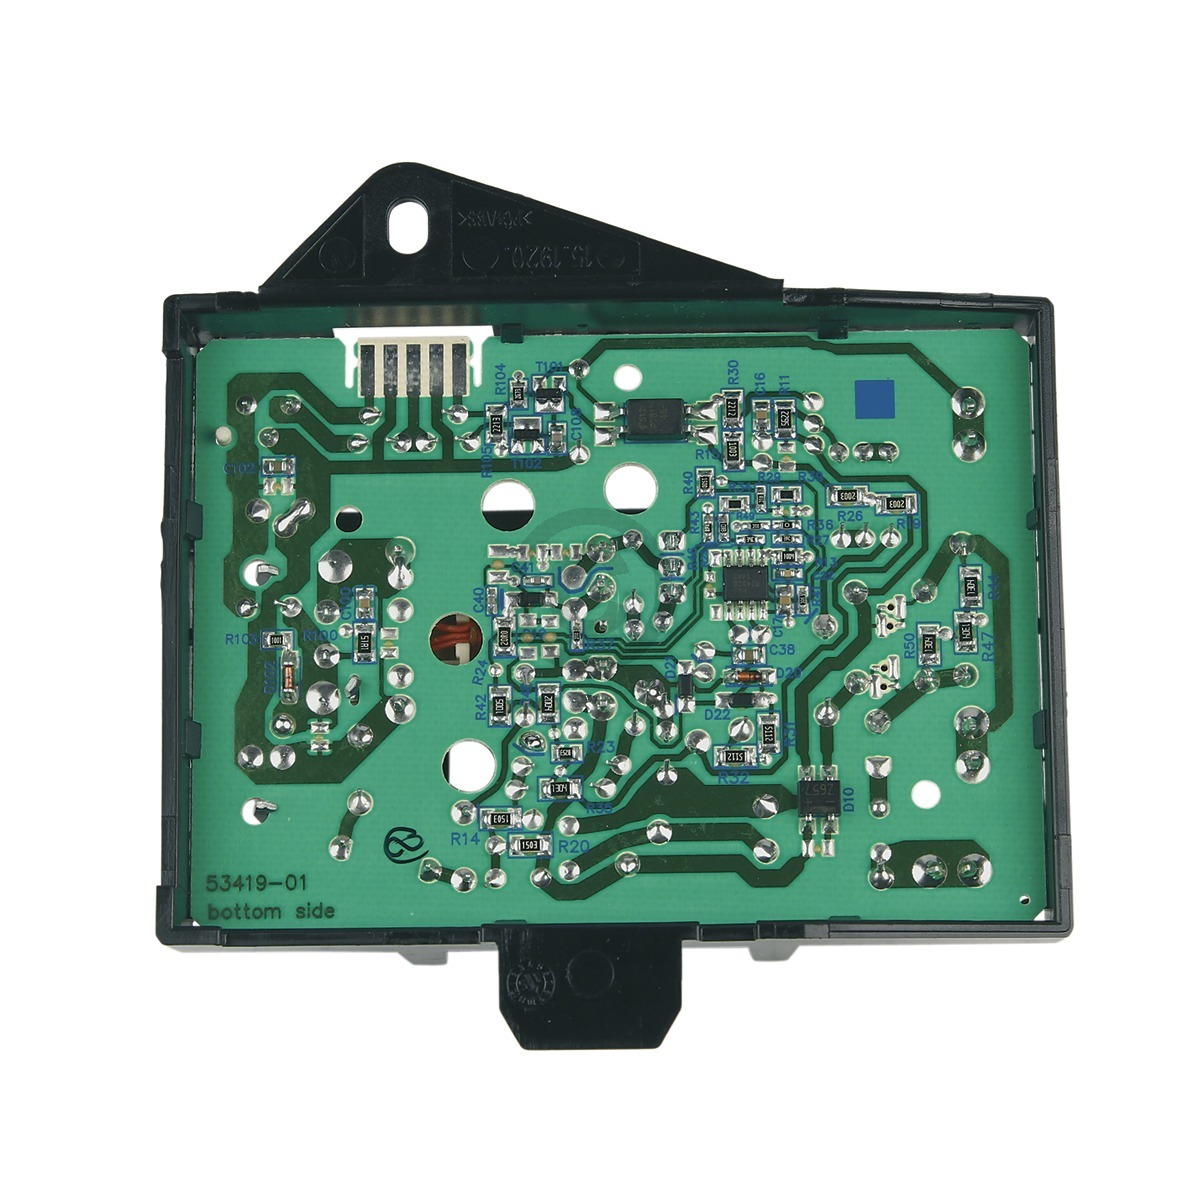 Elektronik Netzmodul 00651994 651994 Bosch, Siemens, Neff